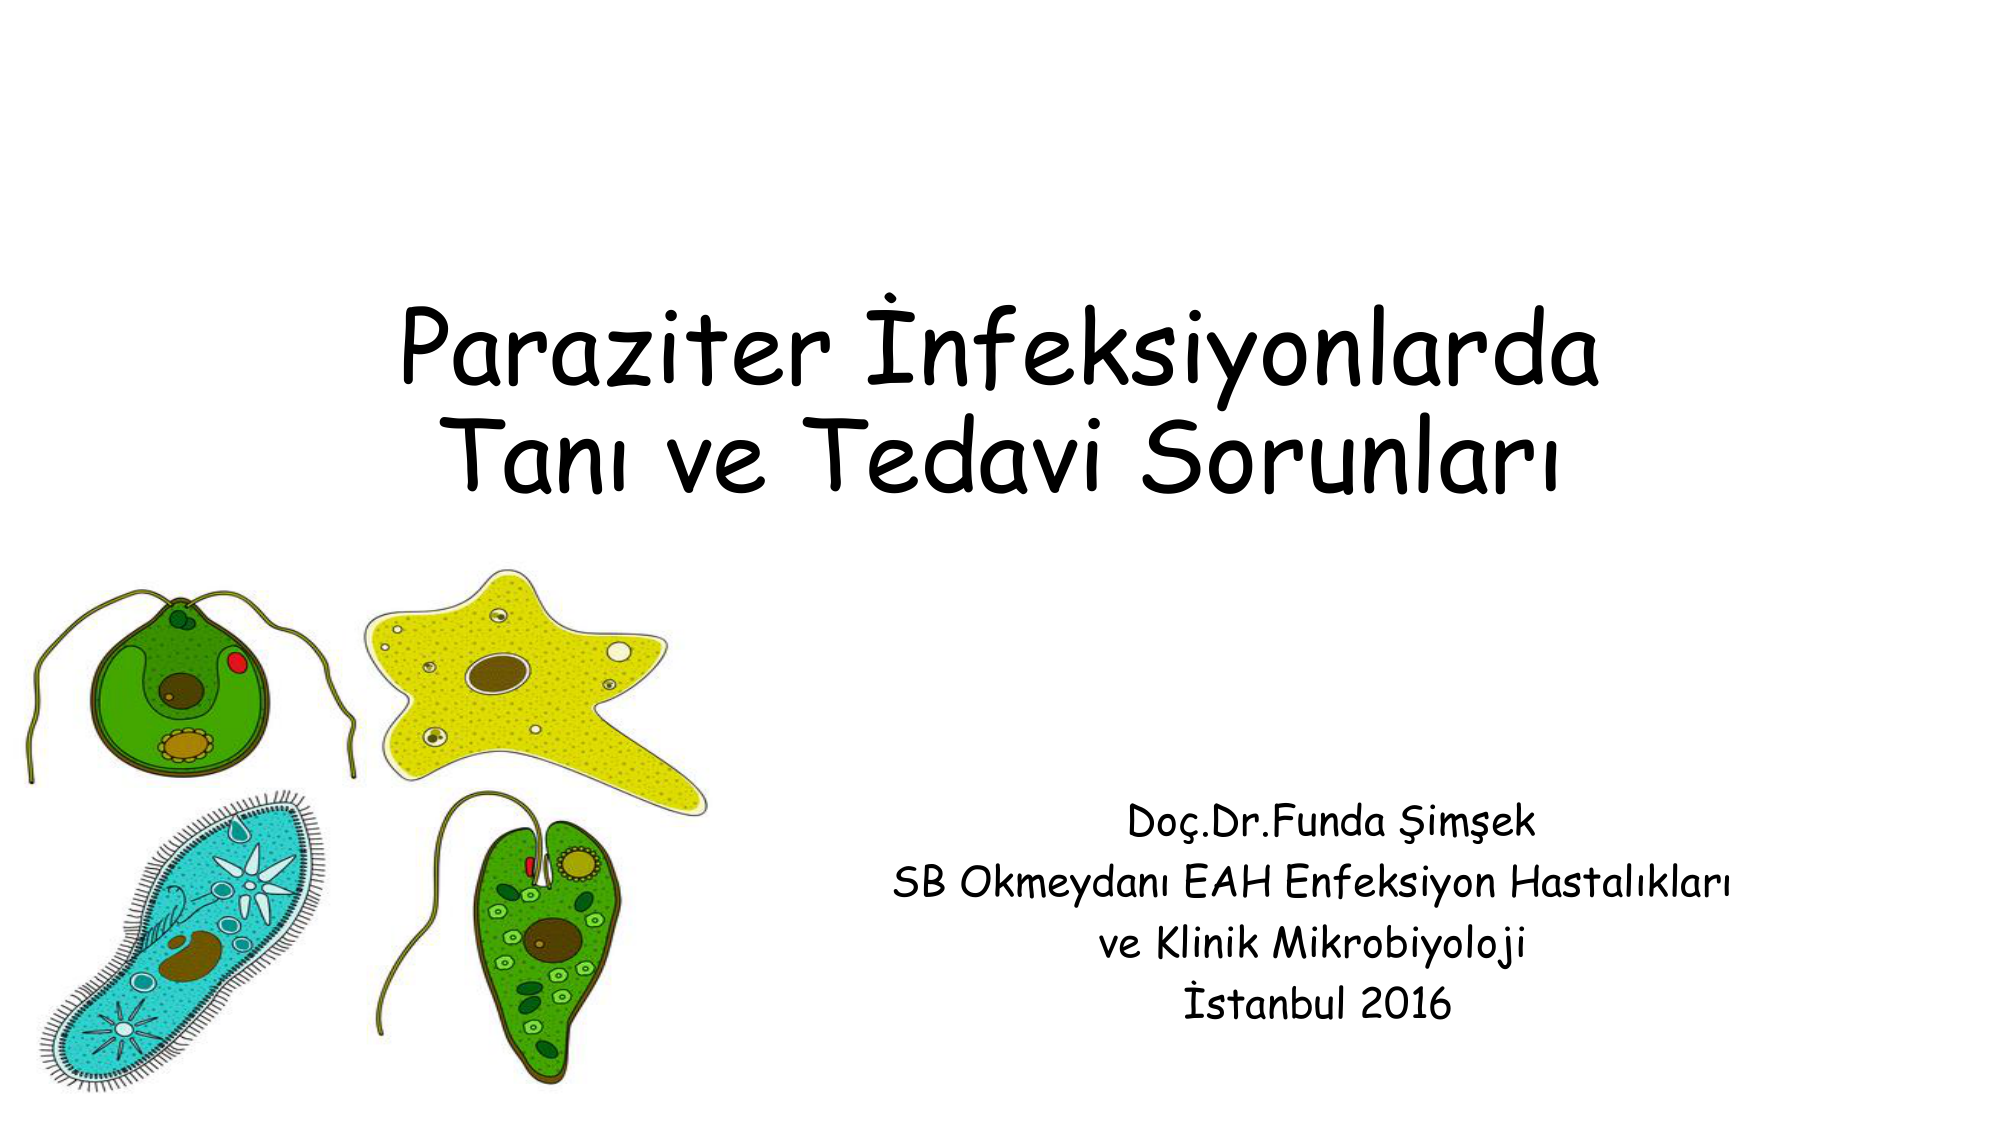 enterobius vermicularis selofan bant yontemi)